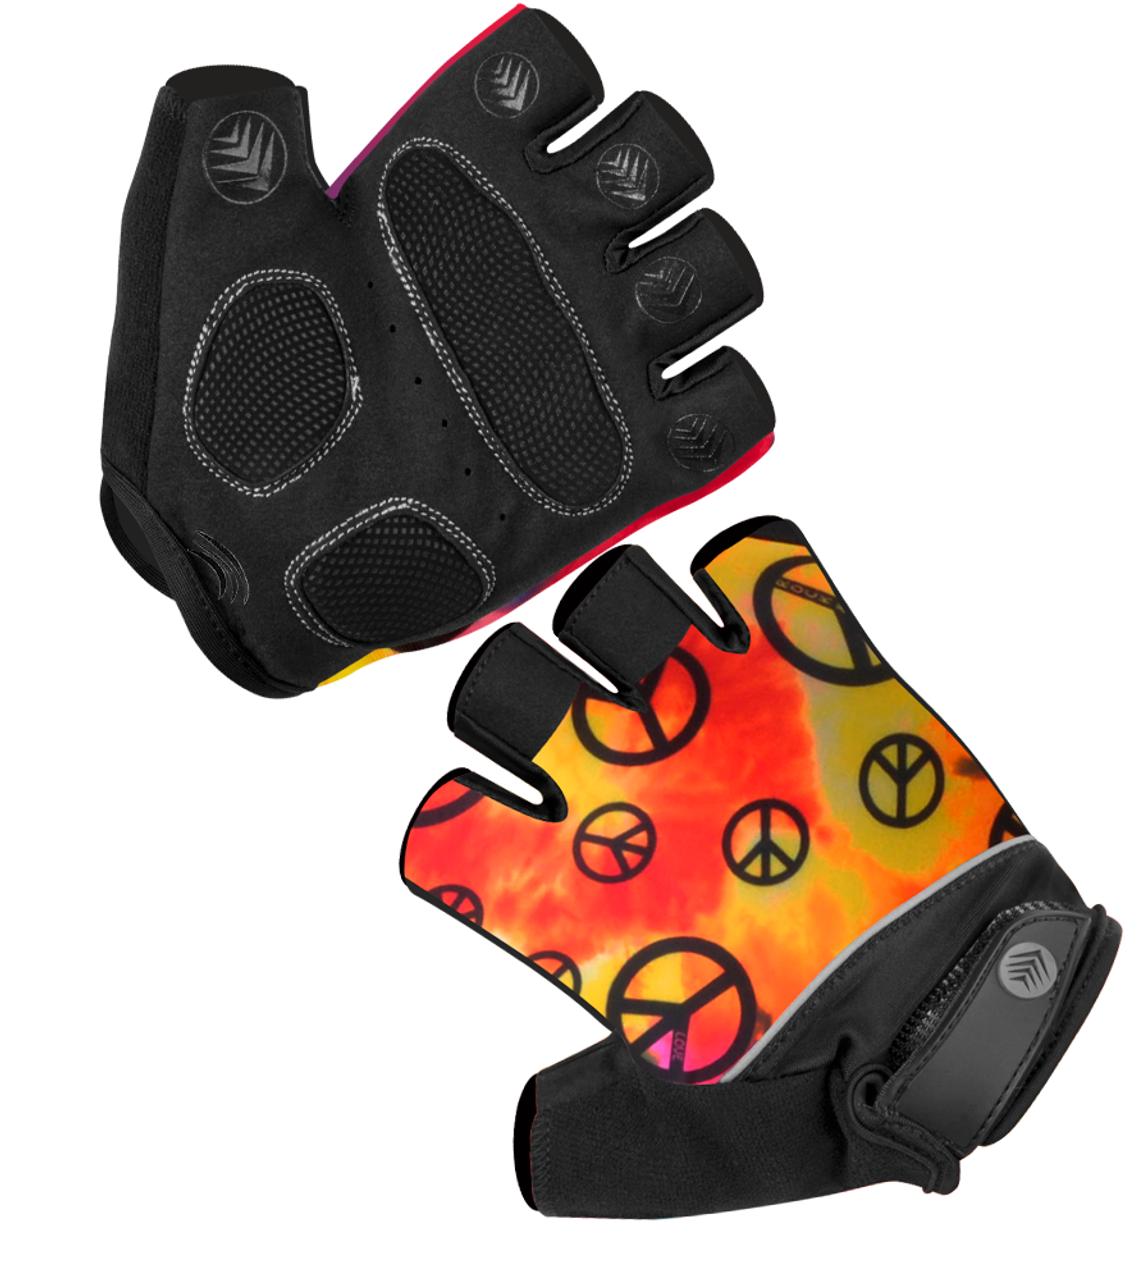 Aero Tech Peace Sign Gel Fingerless Gloves w Wild Print Padded Palms